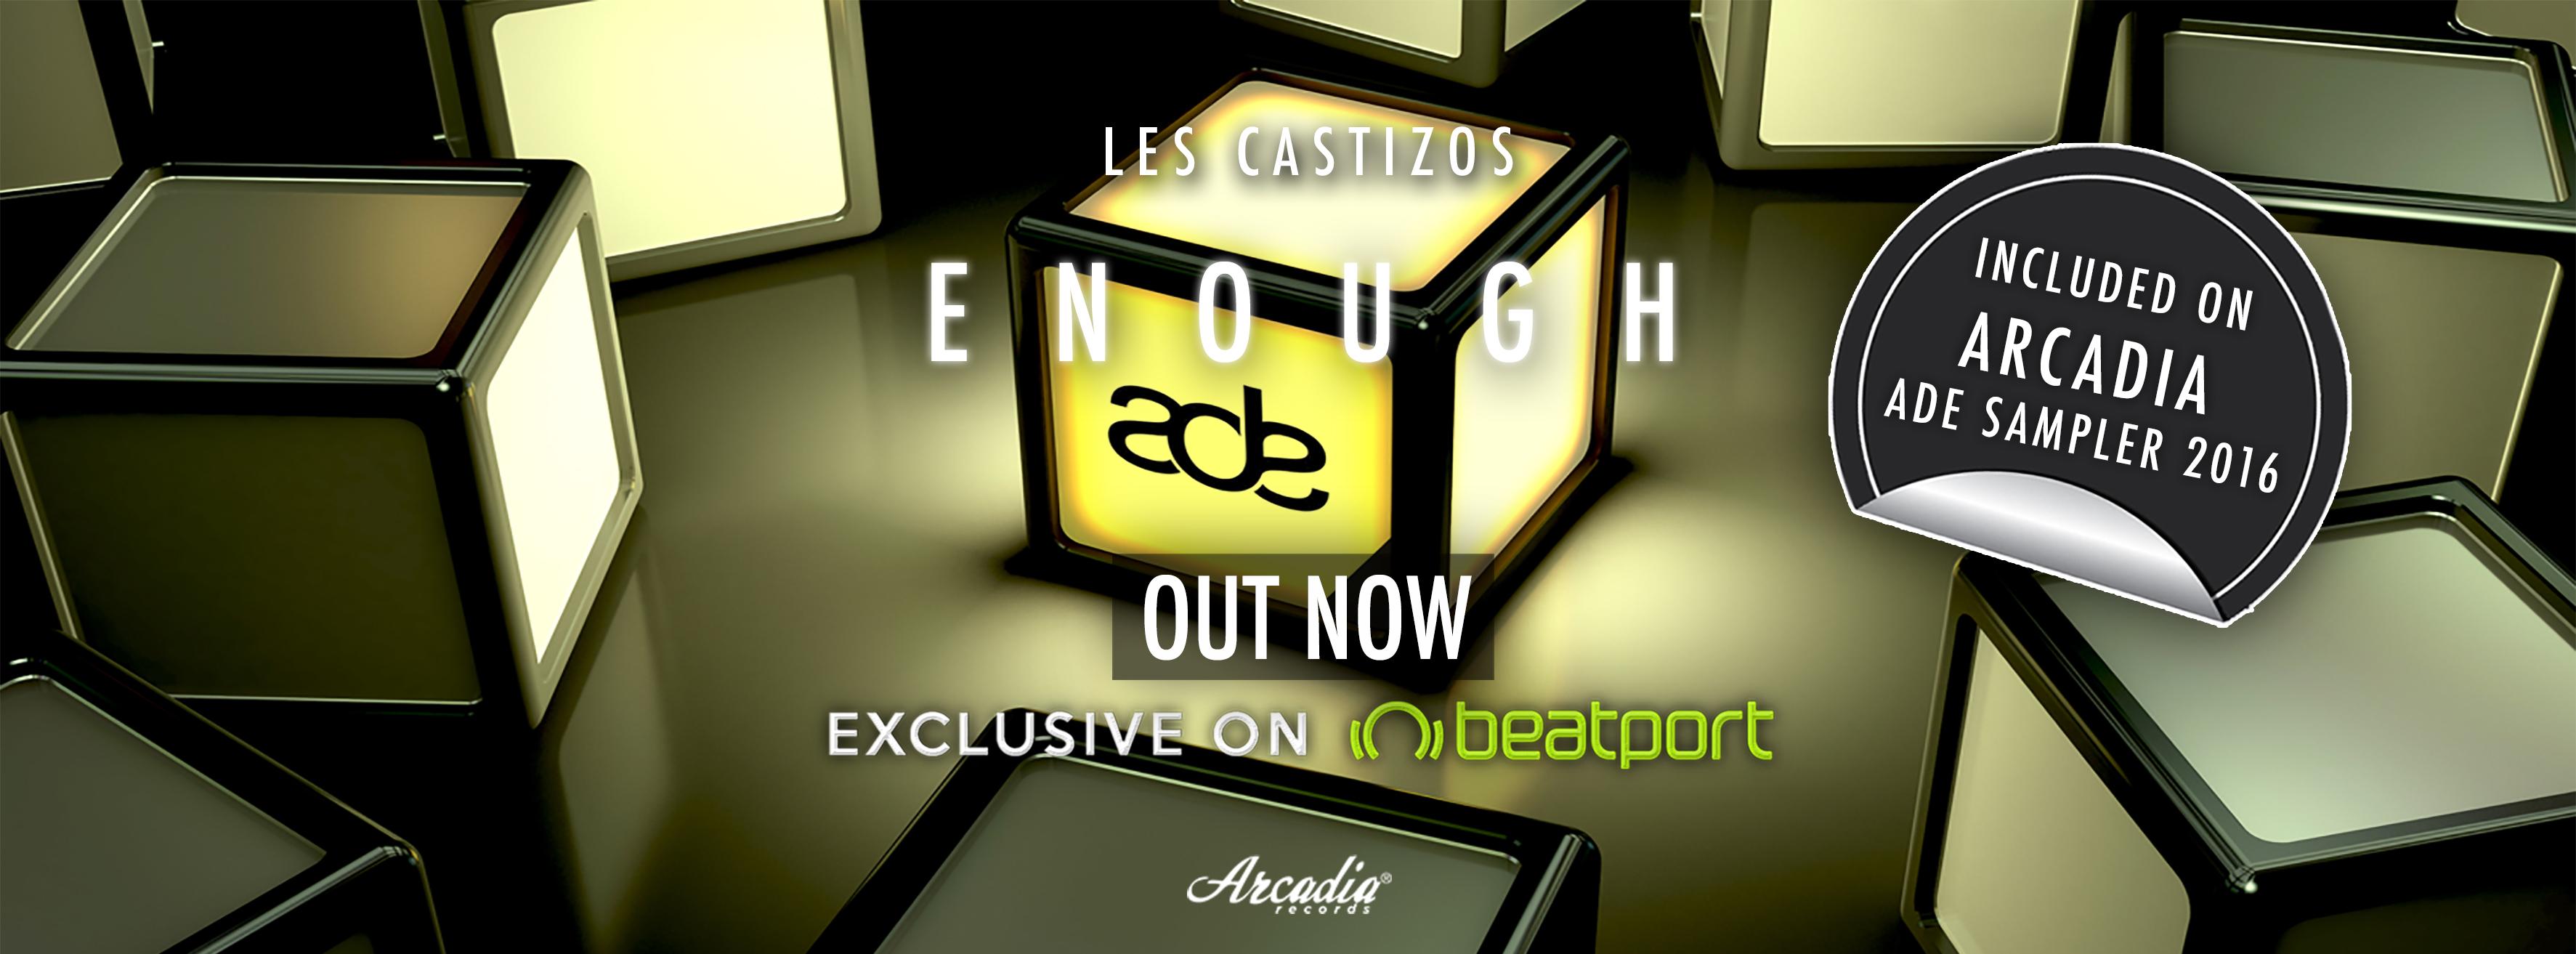 Les Castizos - Enough